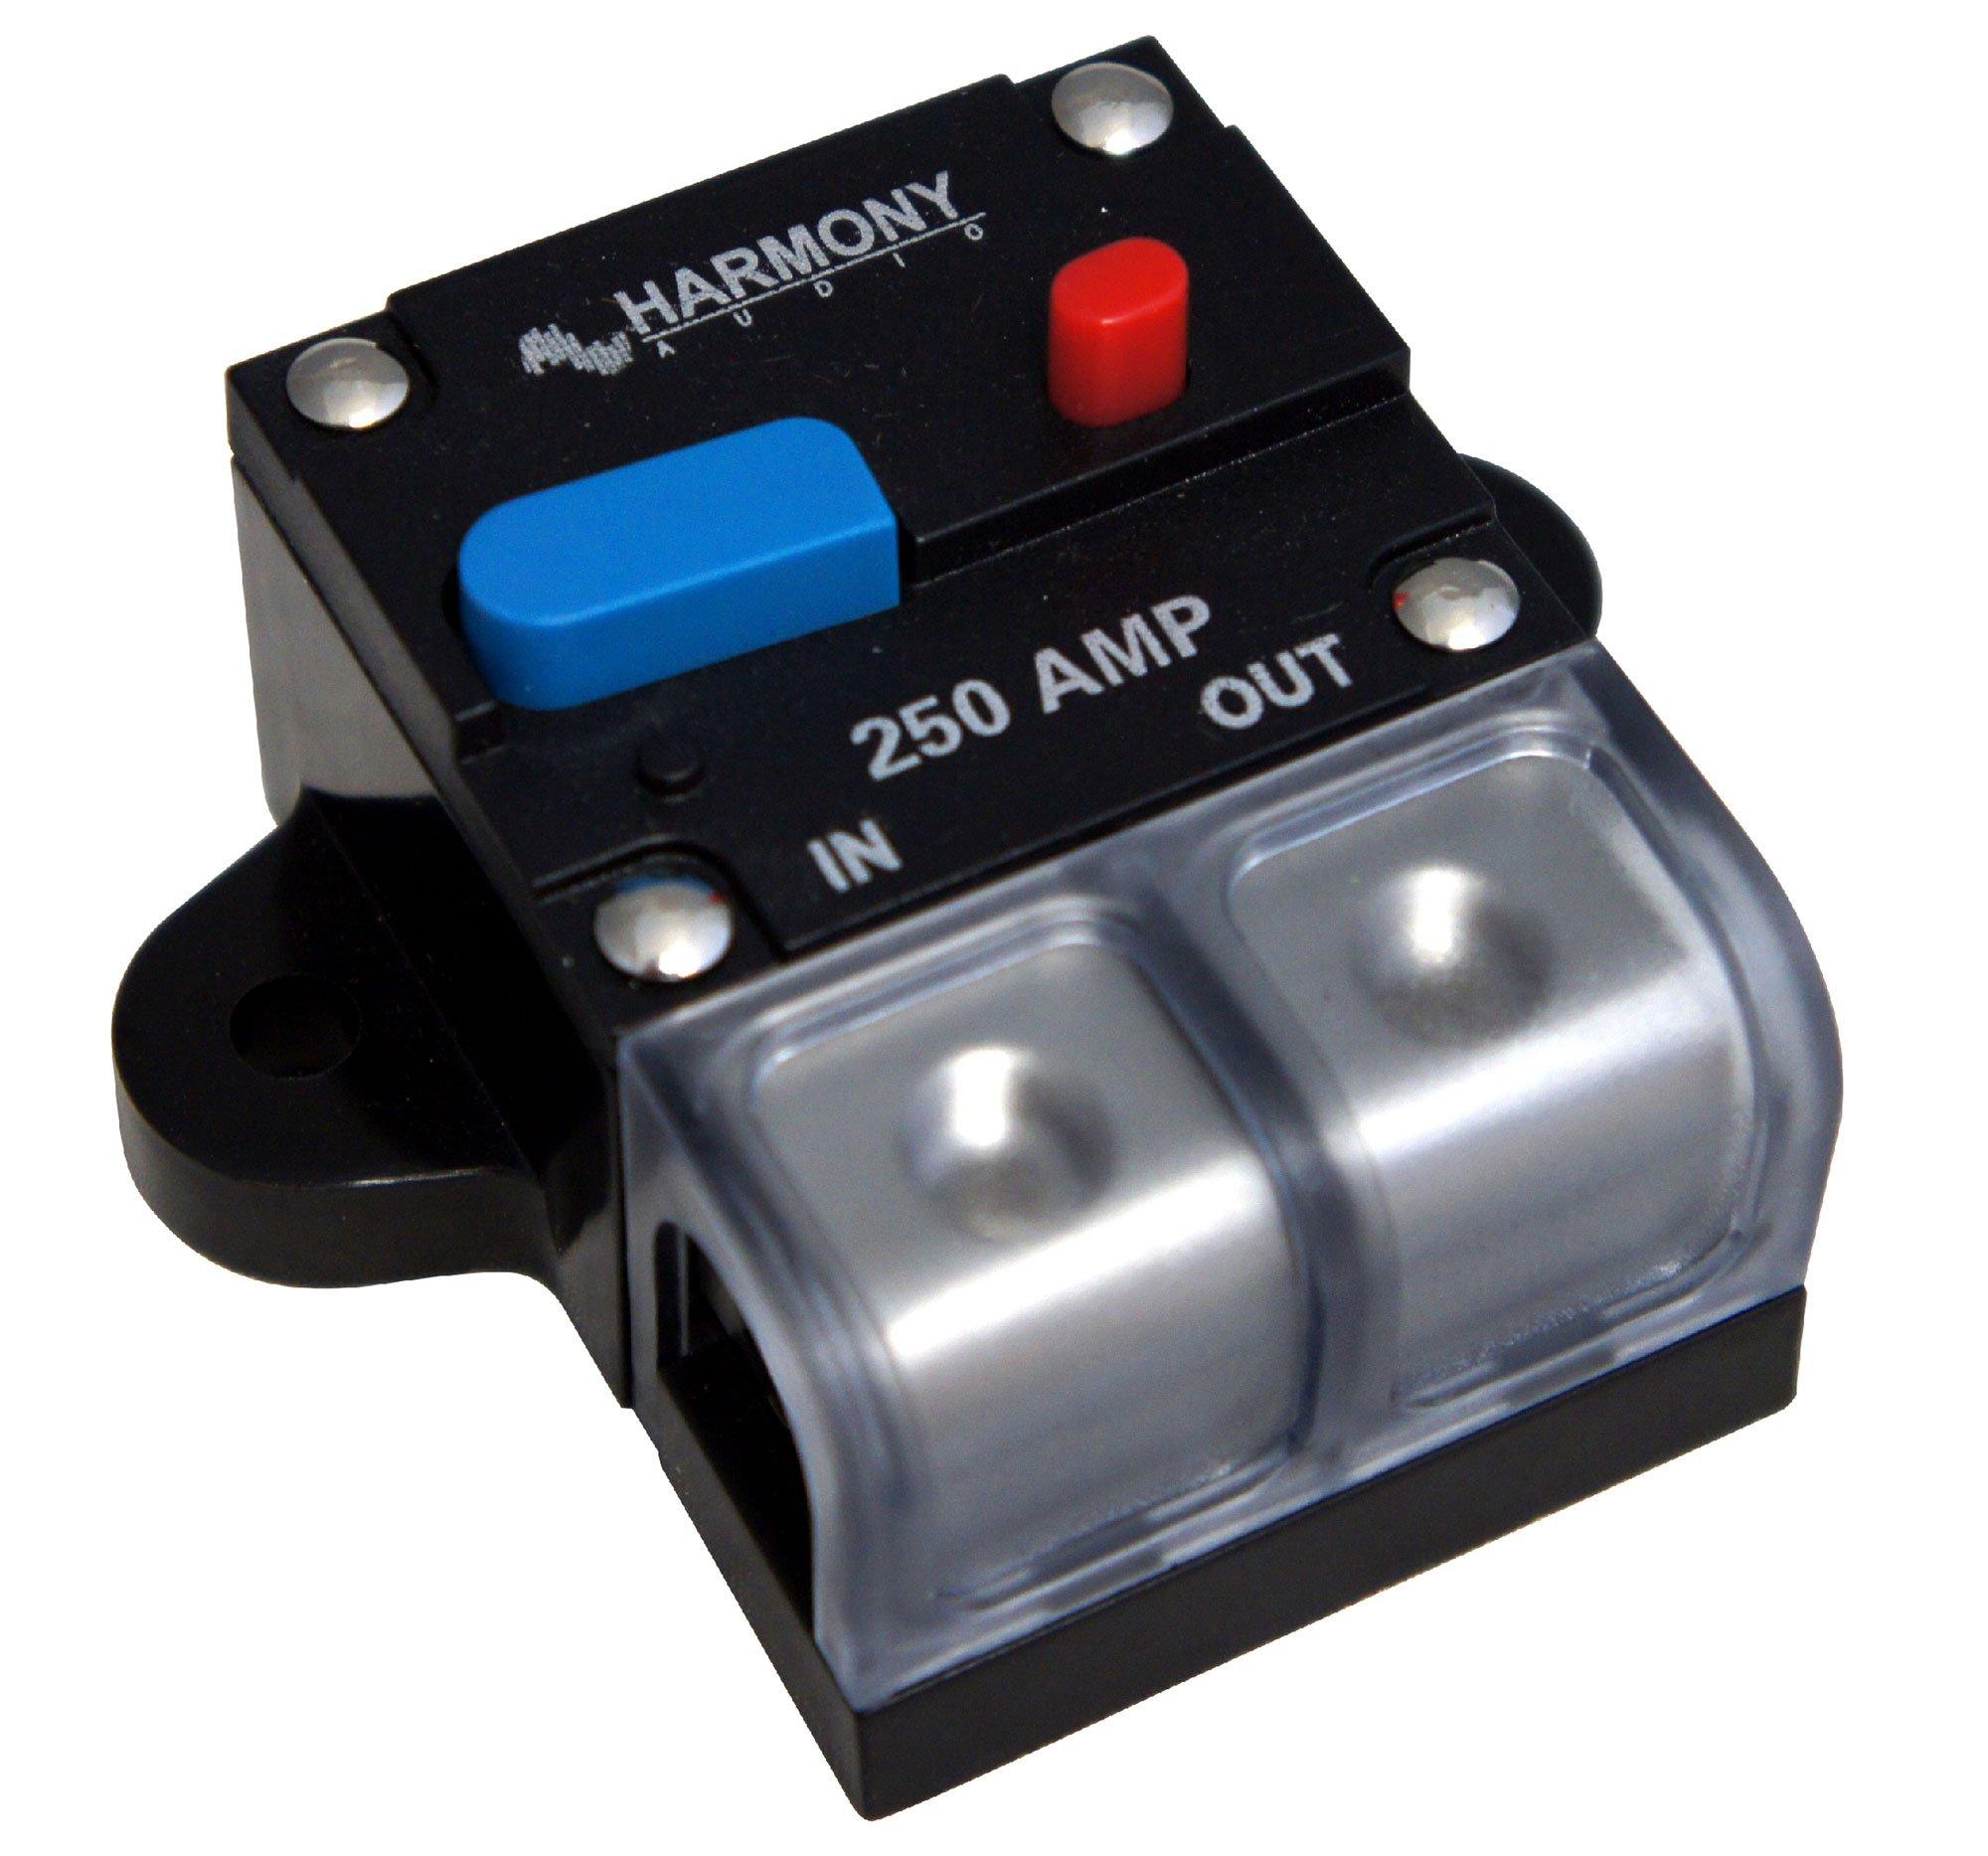 Harmony Audio HA-CB250 Car/Marine Stereo Manual Reset 250 Amp Circuit Breaker 12 Volt